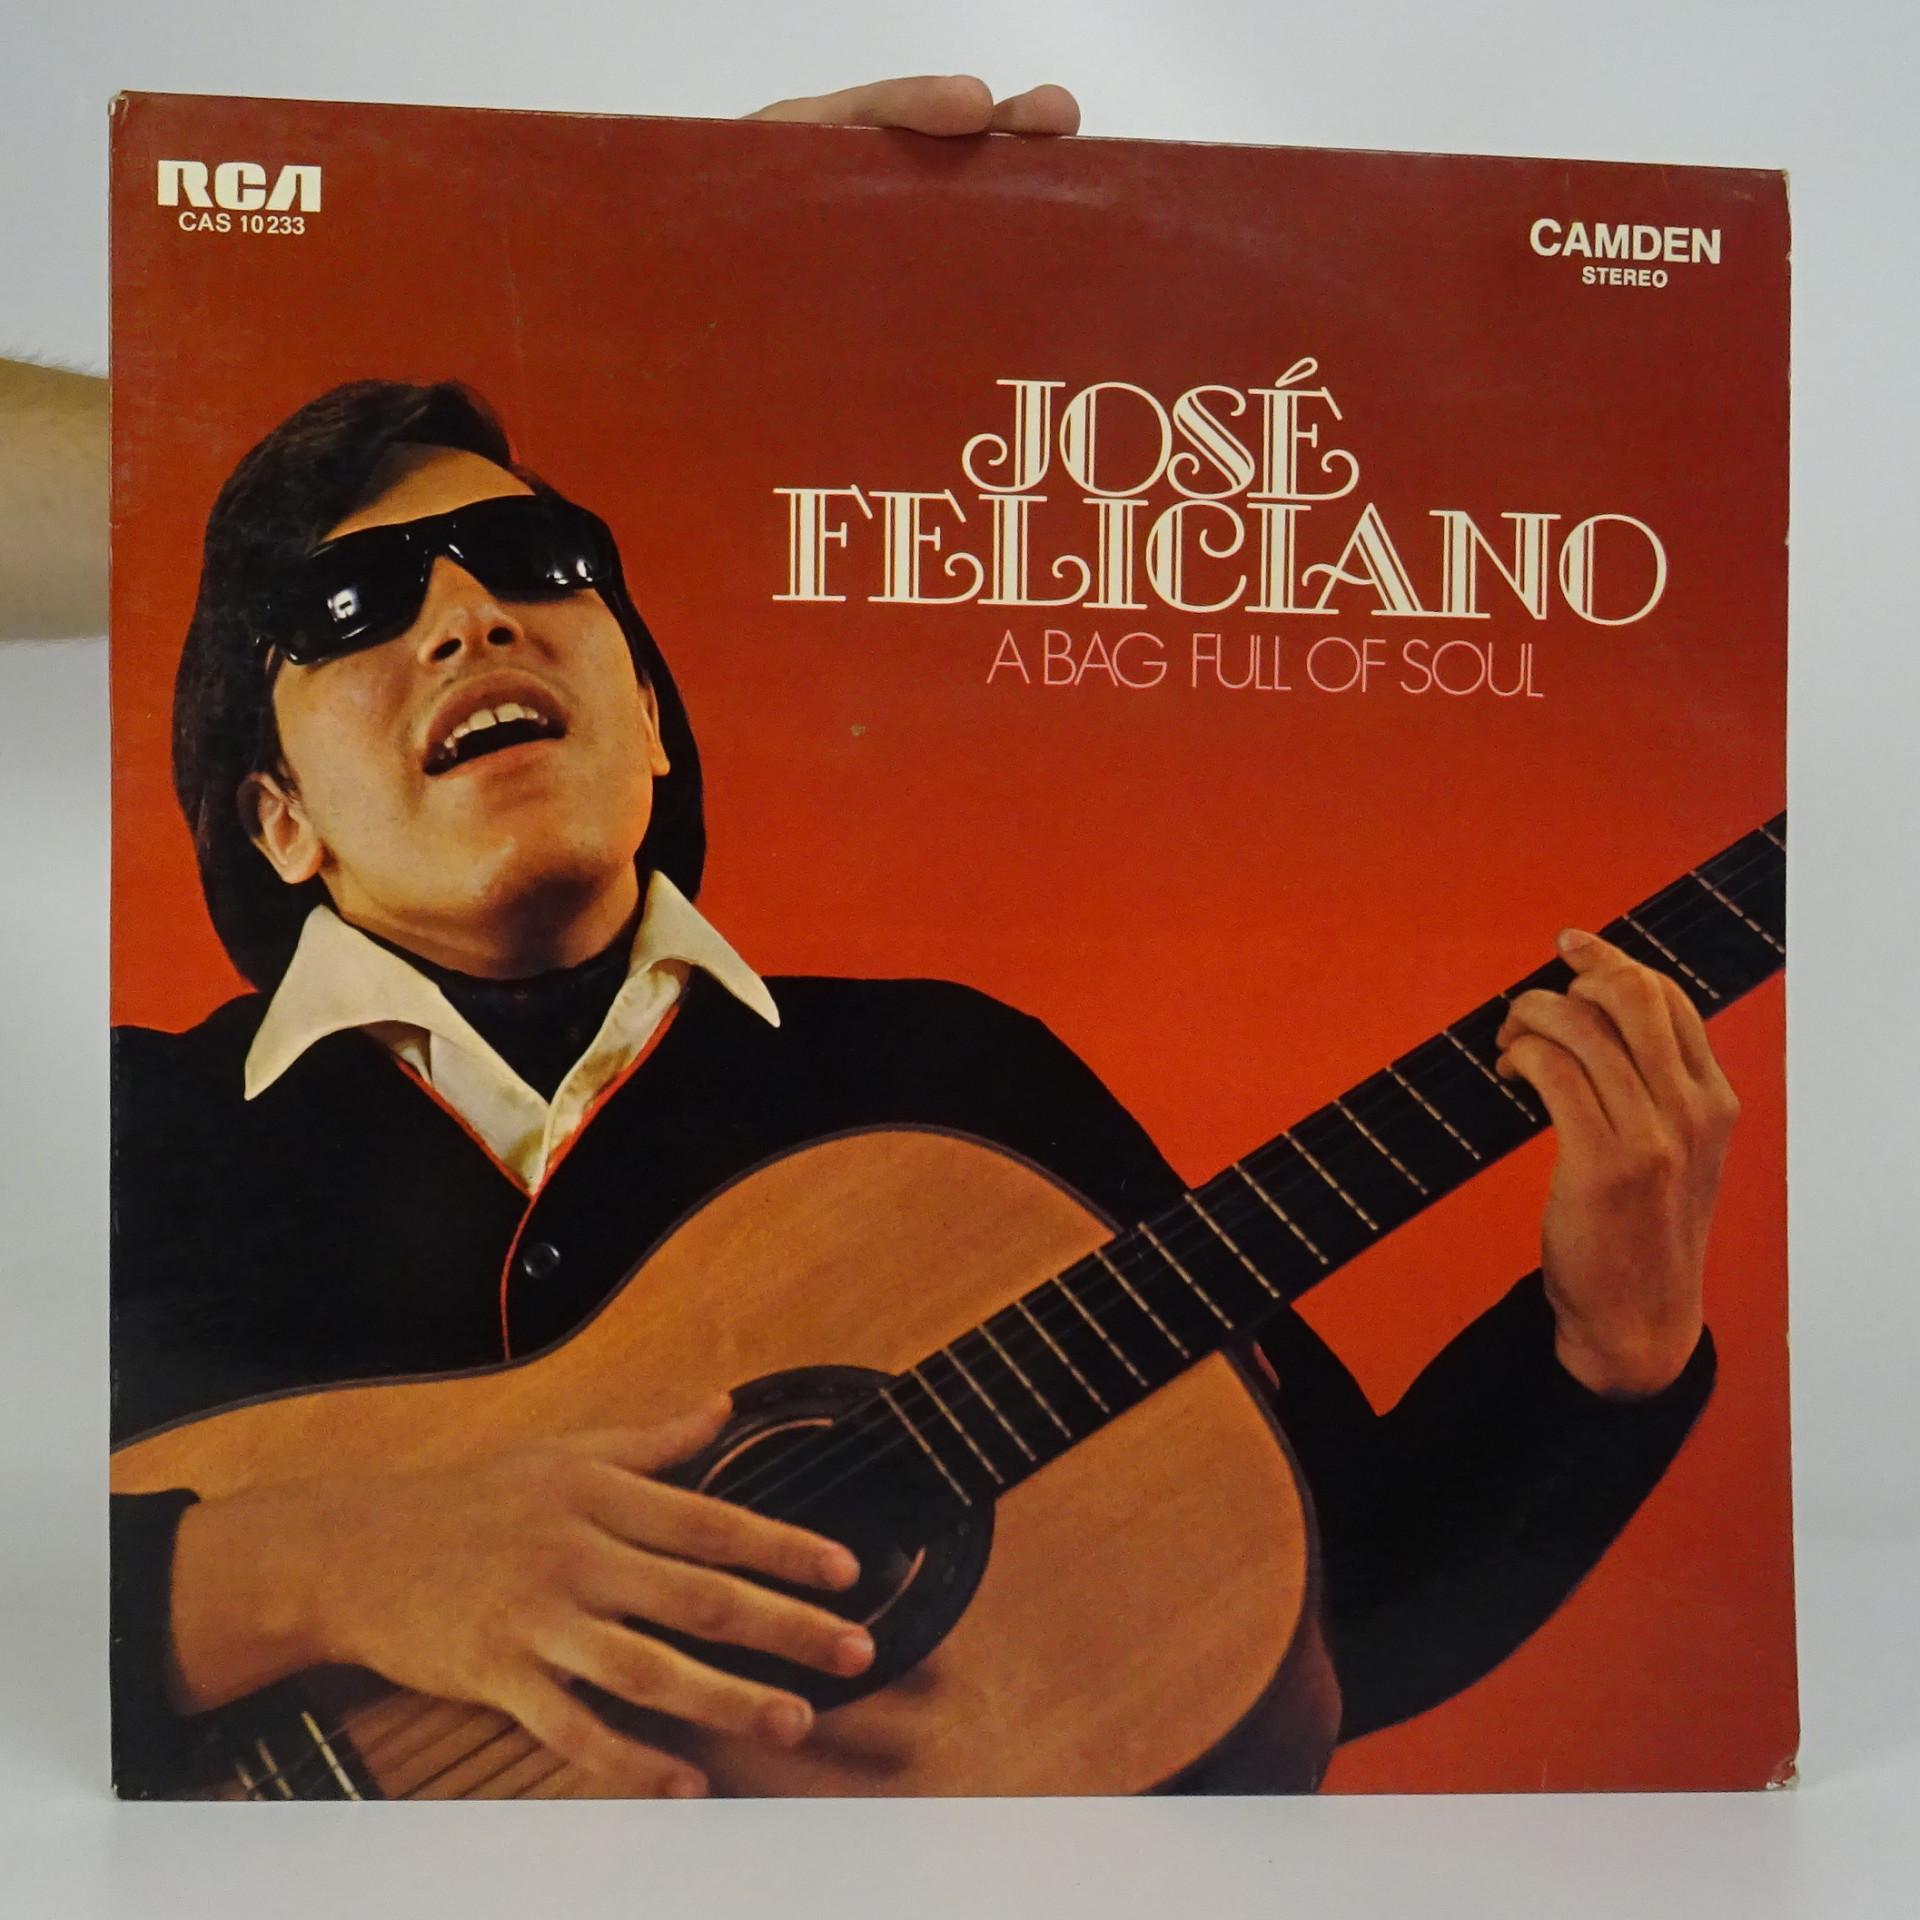 antikvární kniha José Feliciano: A Bag Full of Soul